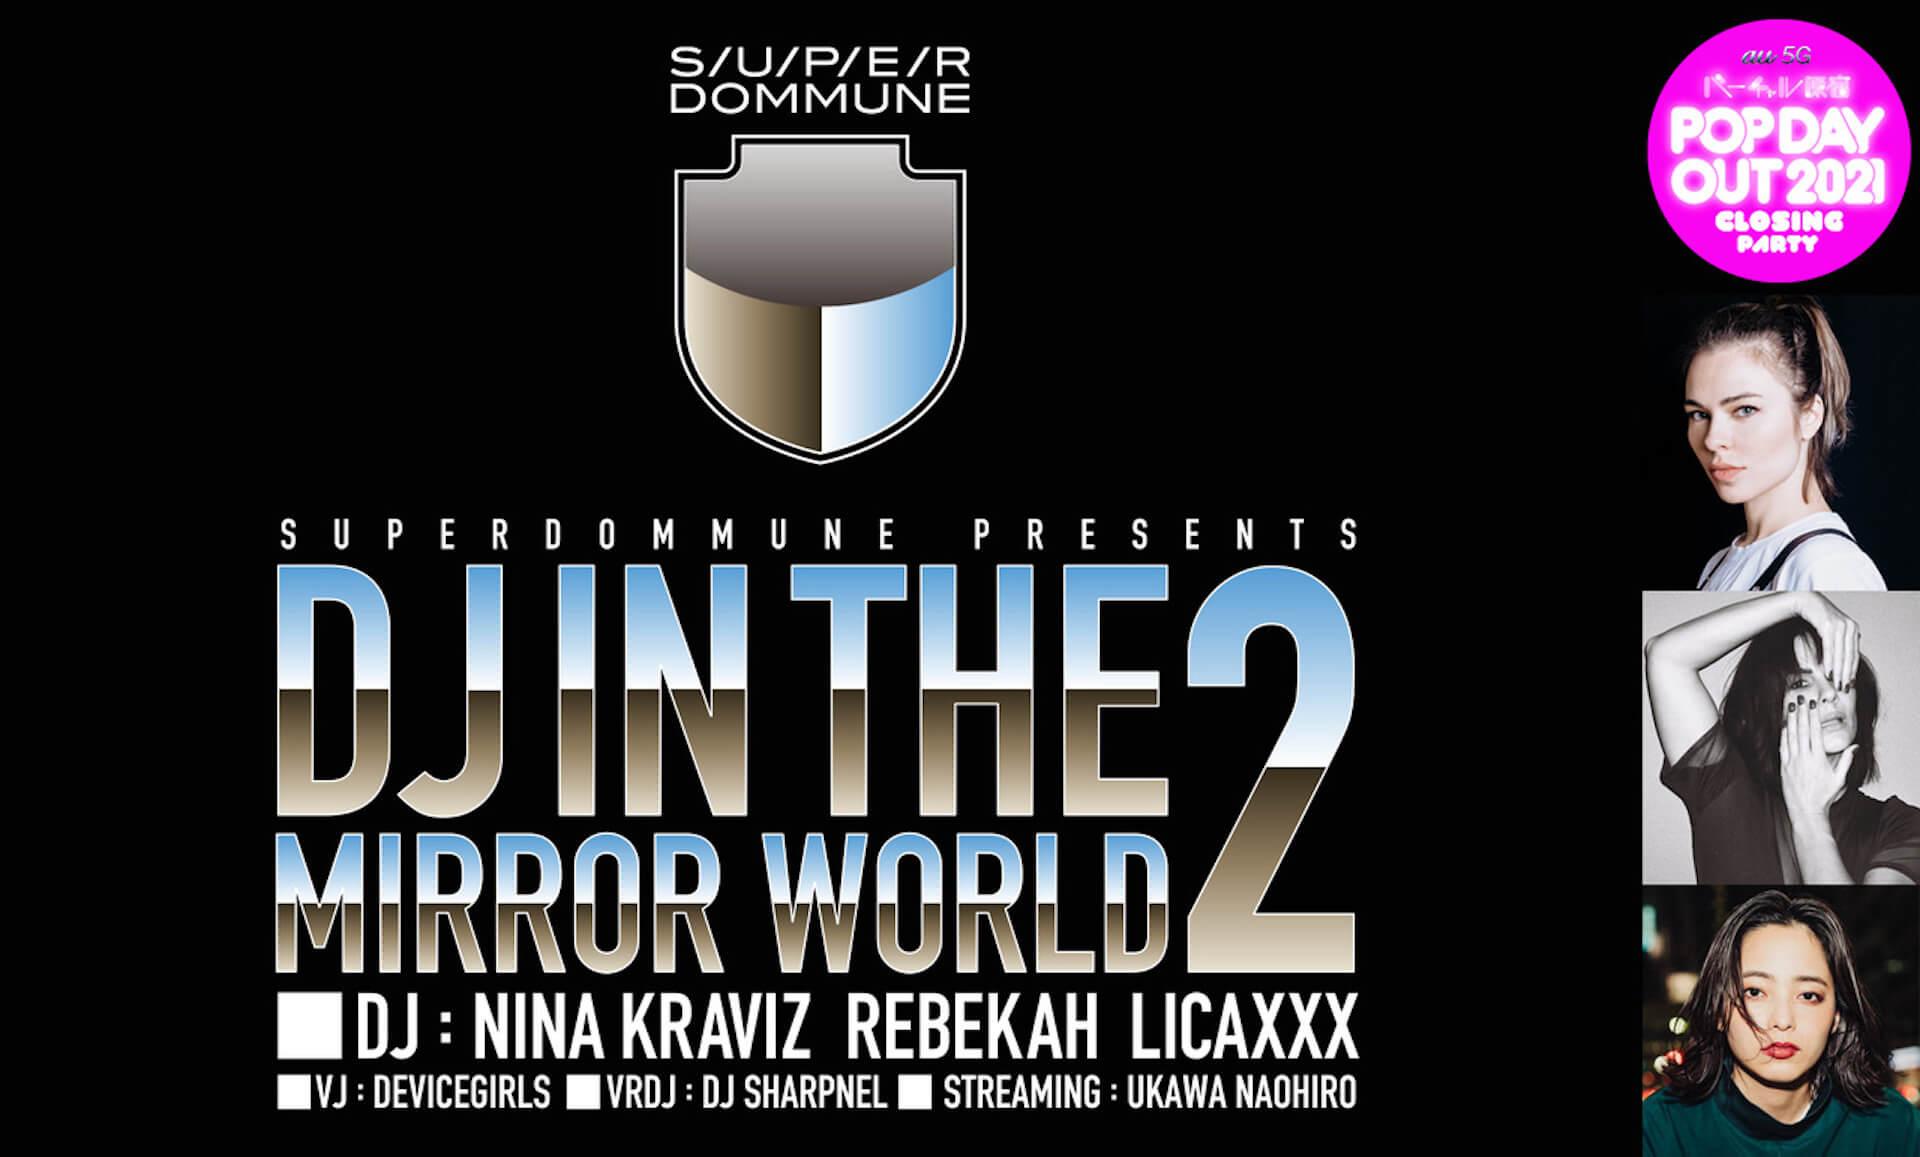 Nina Kraviz、Rebekah、Licaxxxが登場した<DJ IN THE MIRROR WORLD VOL.2>DJイベントのフル尺映像がアーカイブとして公開中! music210603_virtualharajuku_1